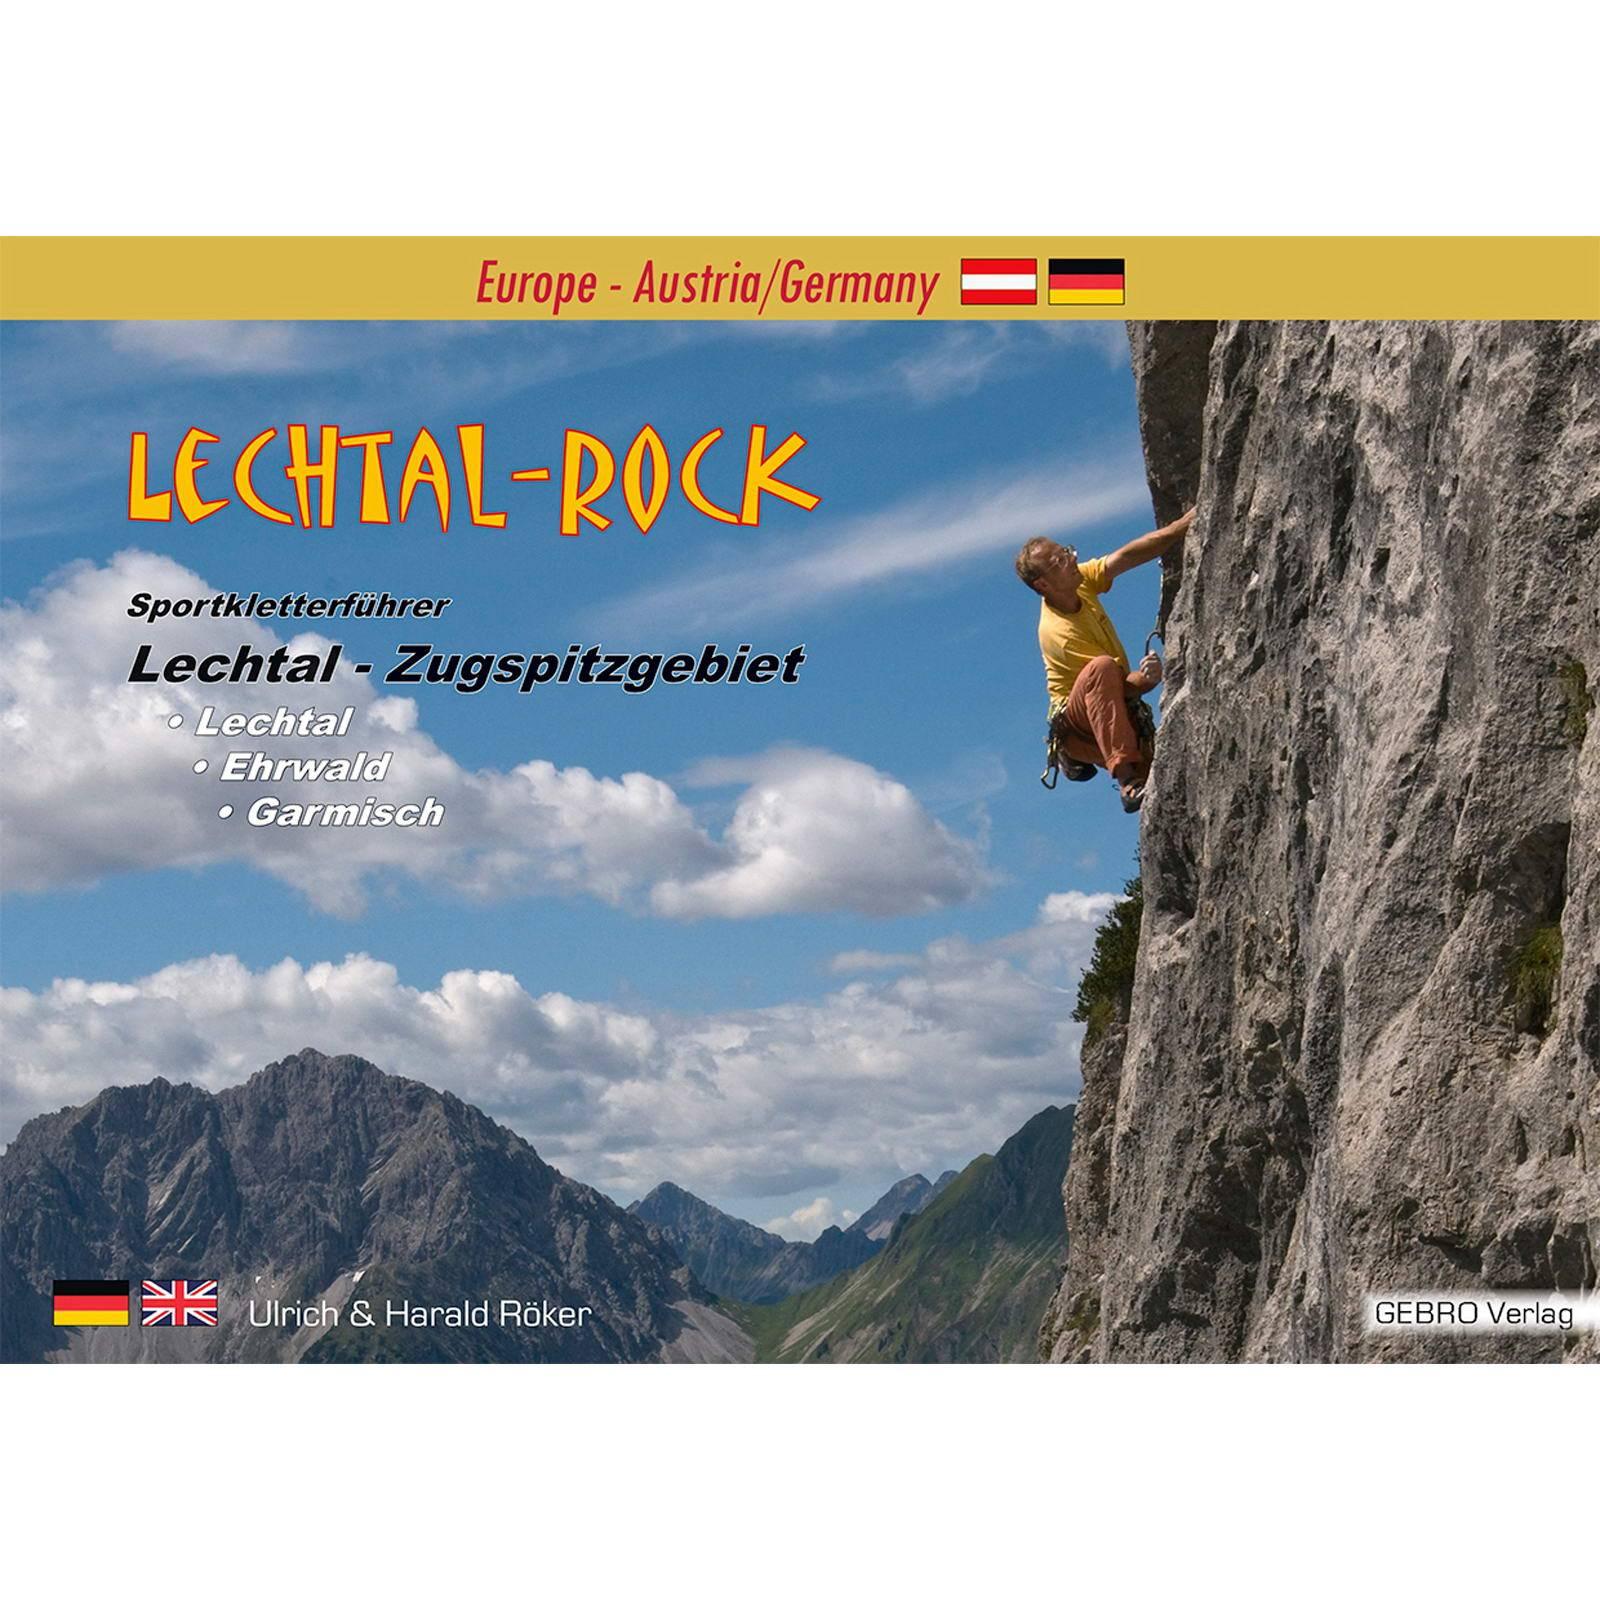 Gebro Verlag Lechtal Rock - KletterfĂĽhrer